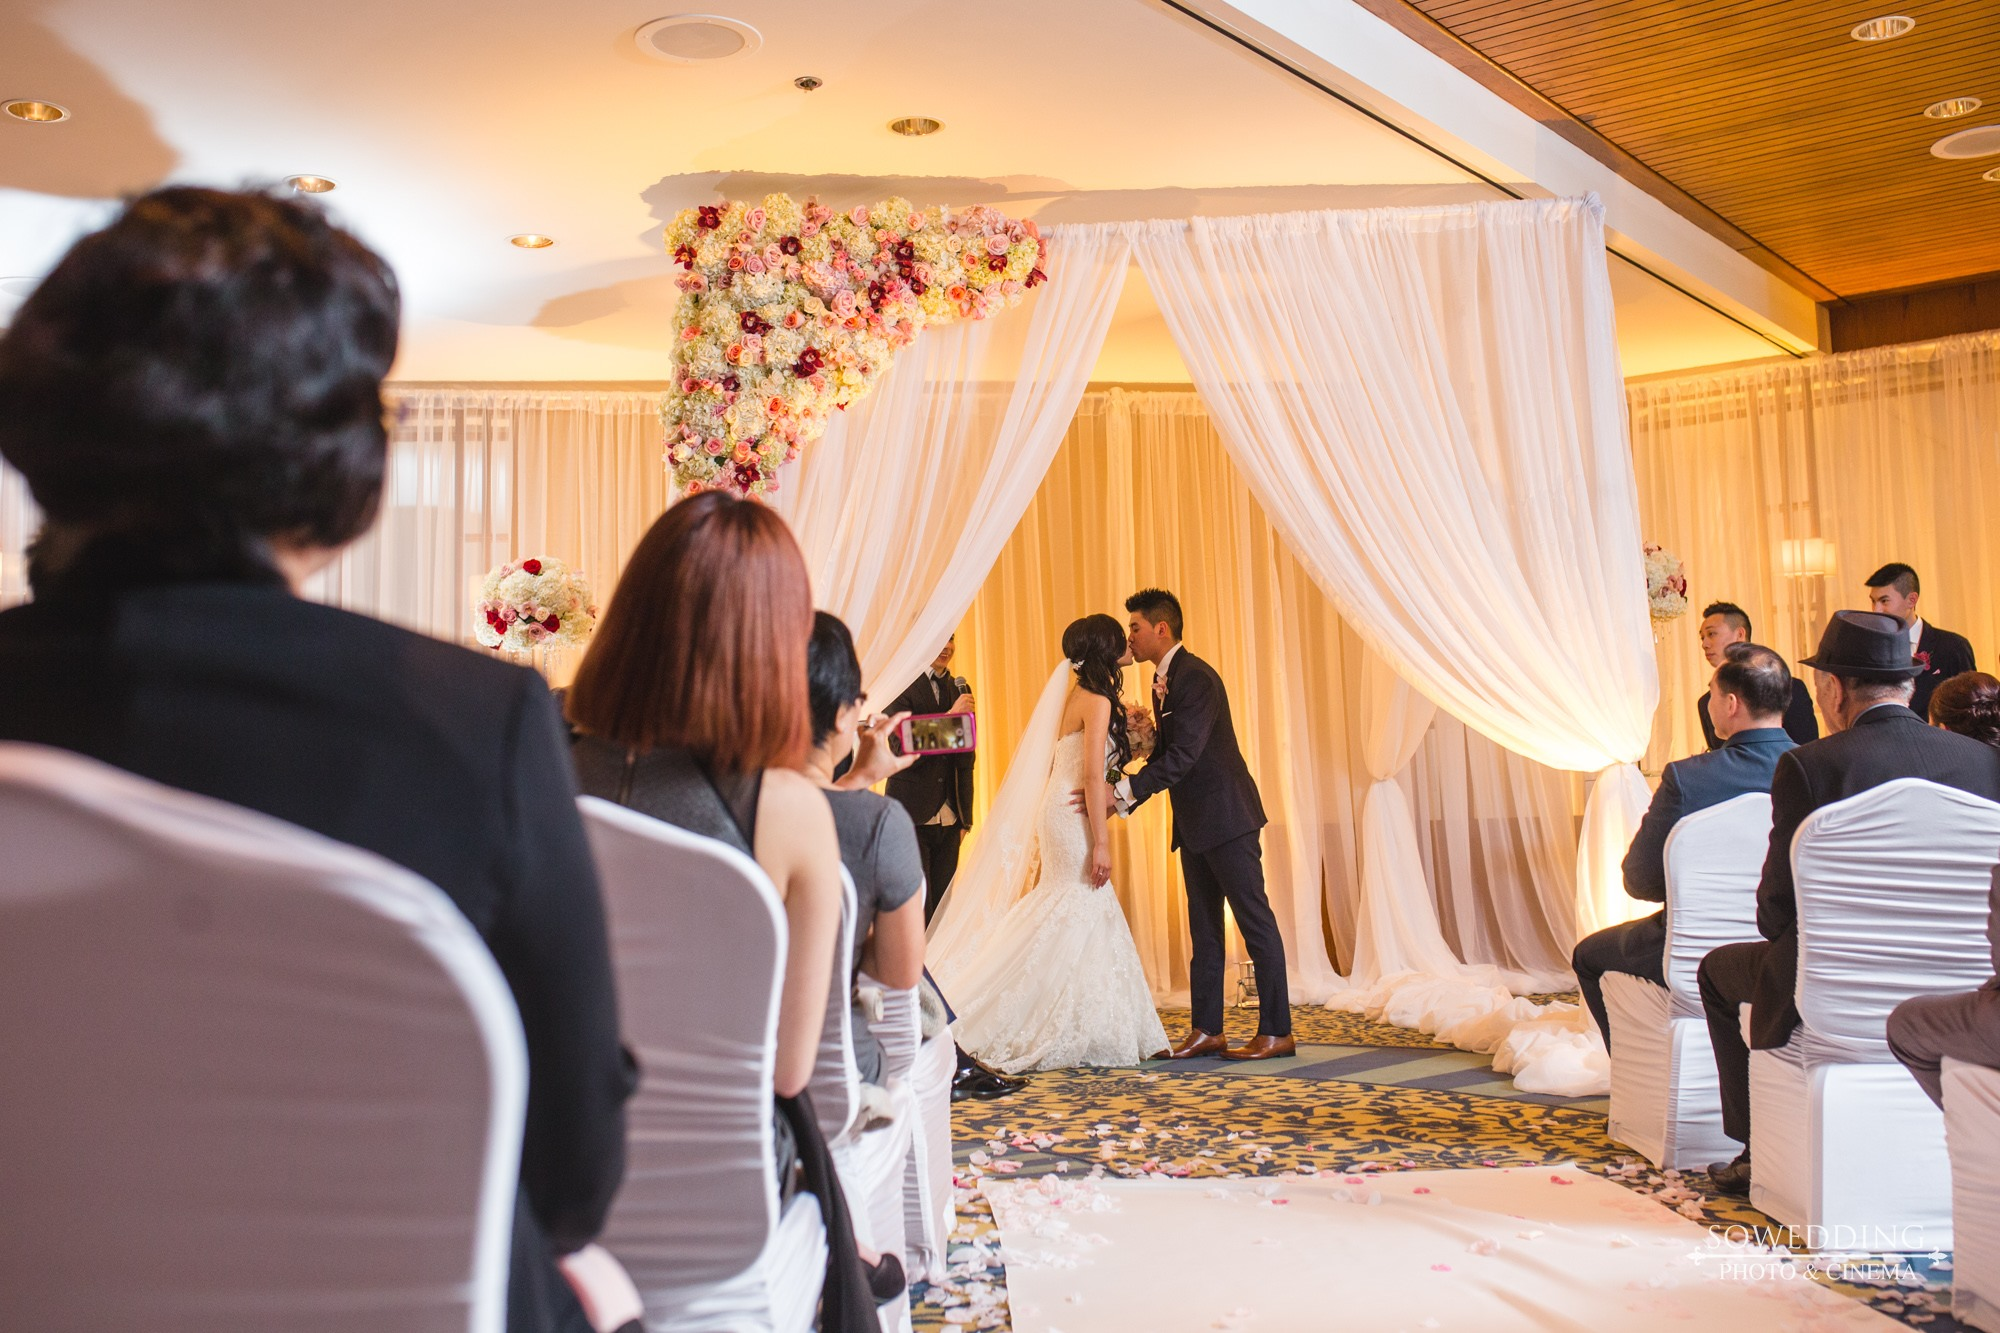 2016Mar26-Priscilla&Michael-wedding-HL-SD-0162